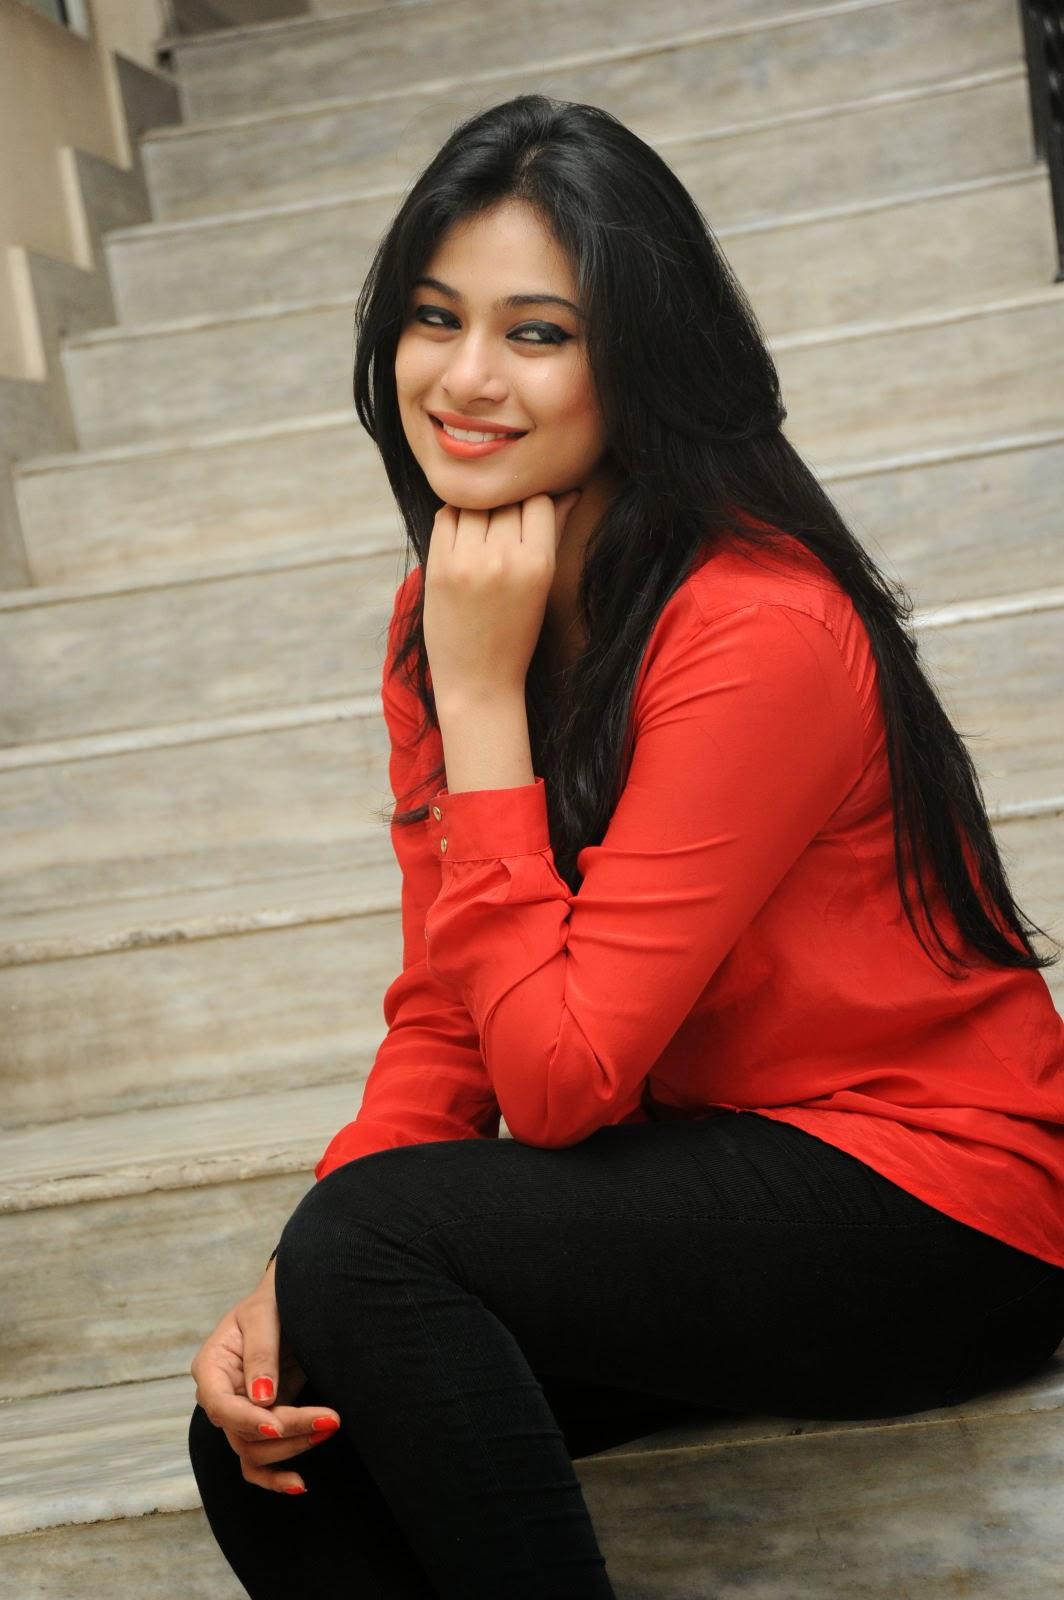 Zara Shah hot looks